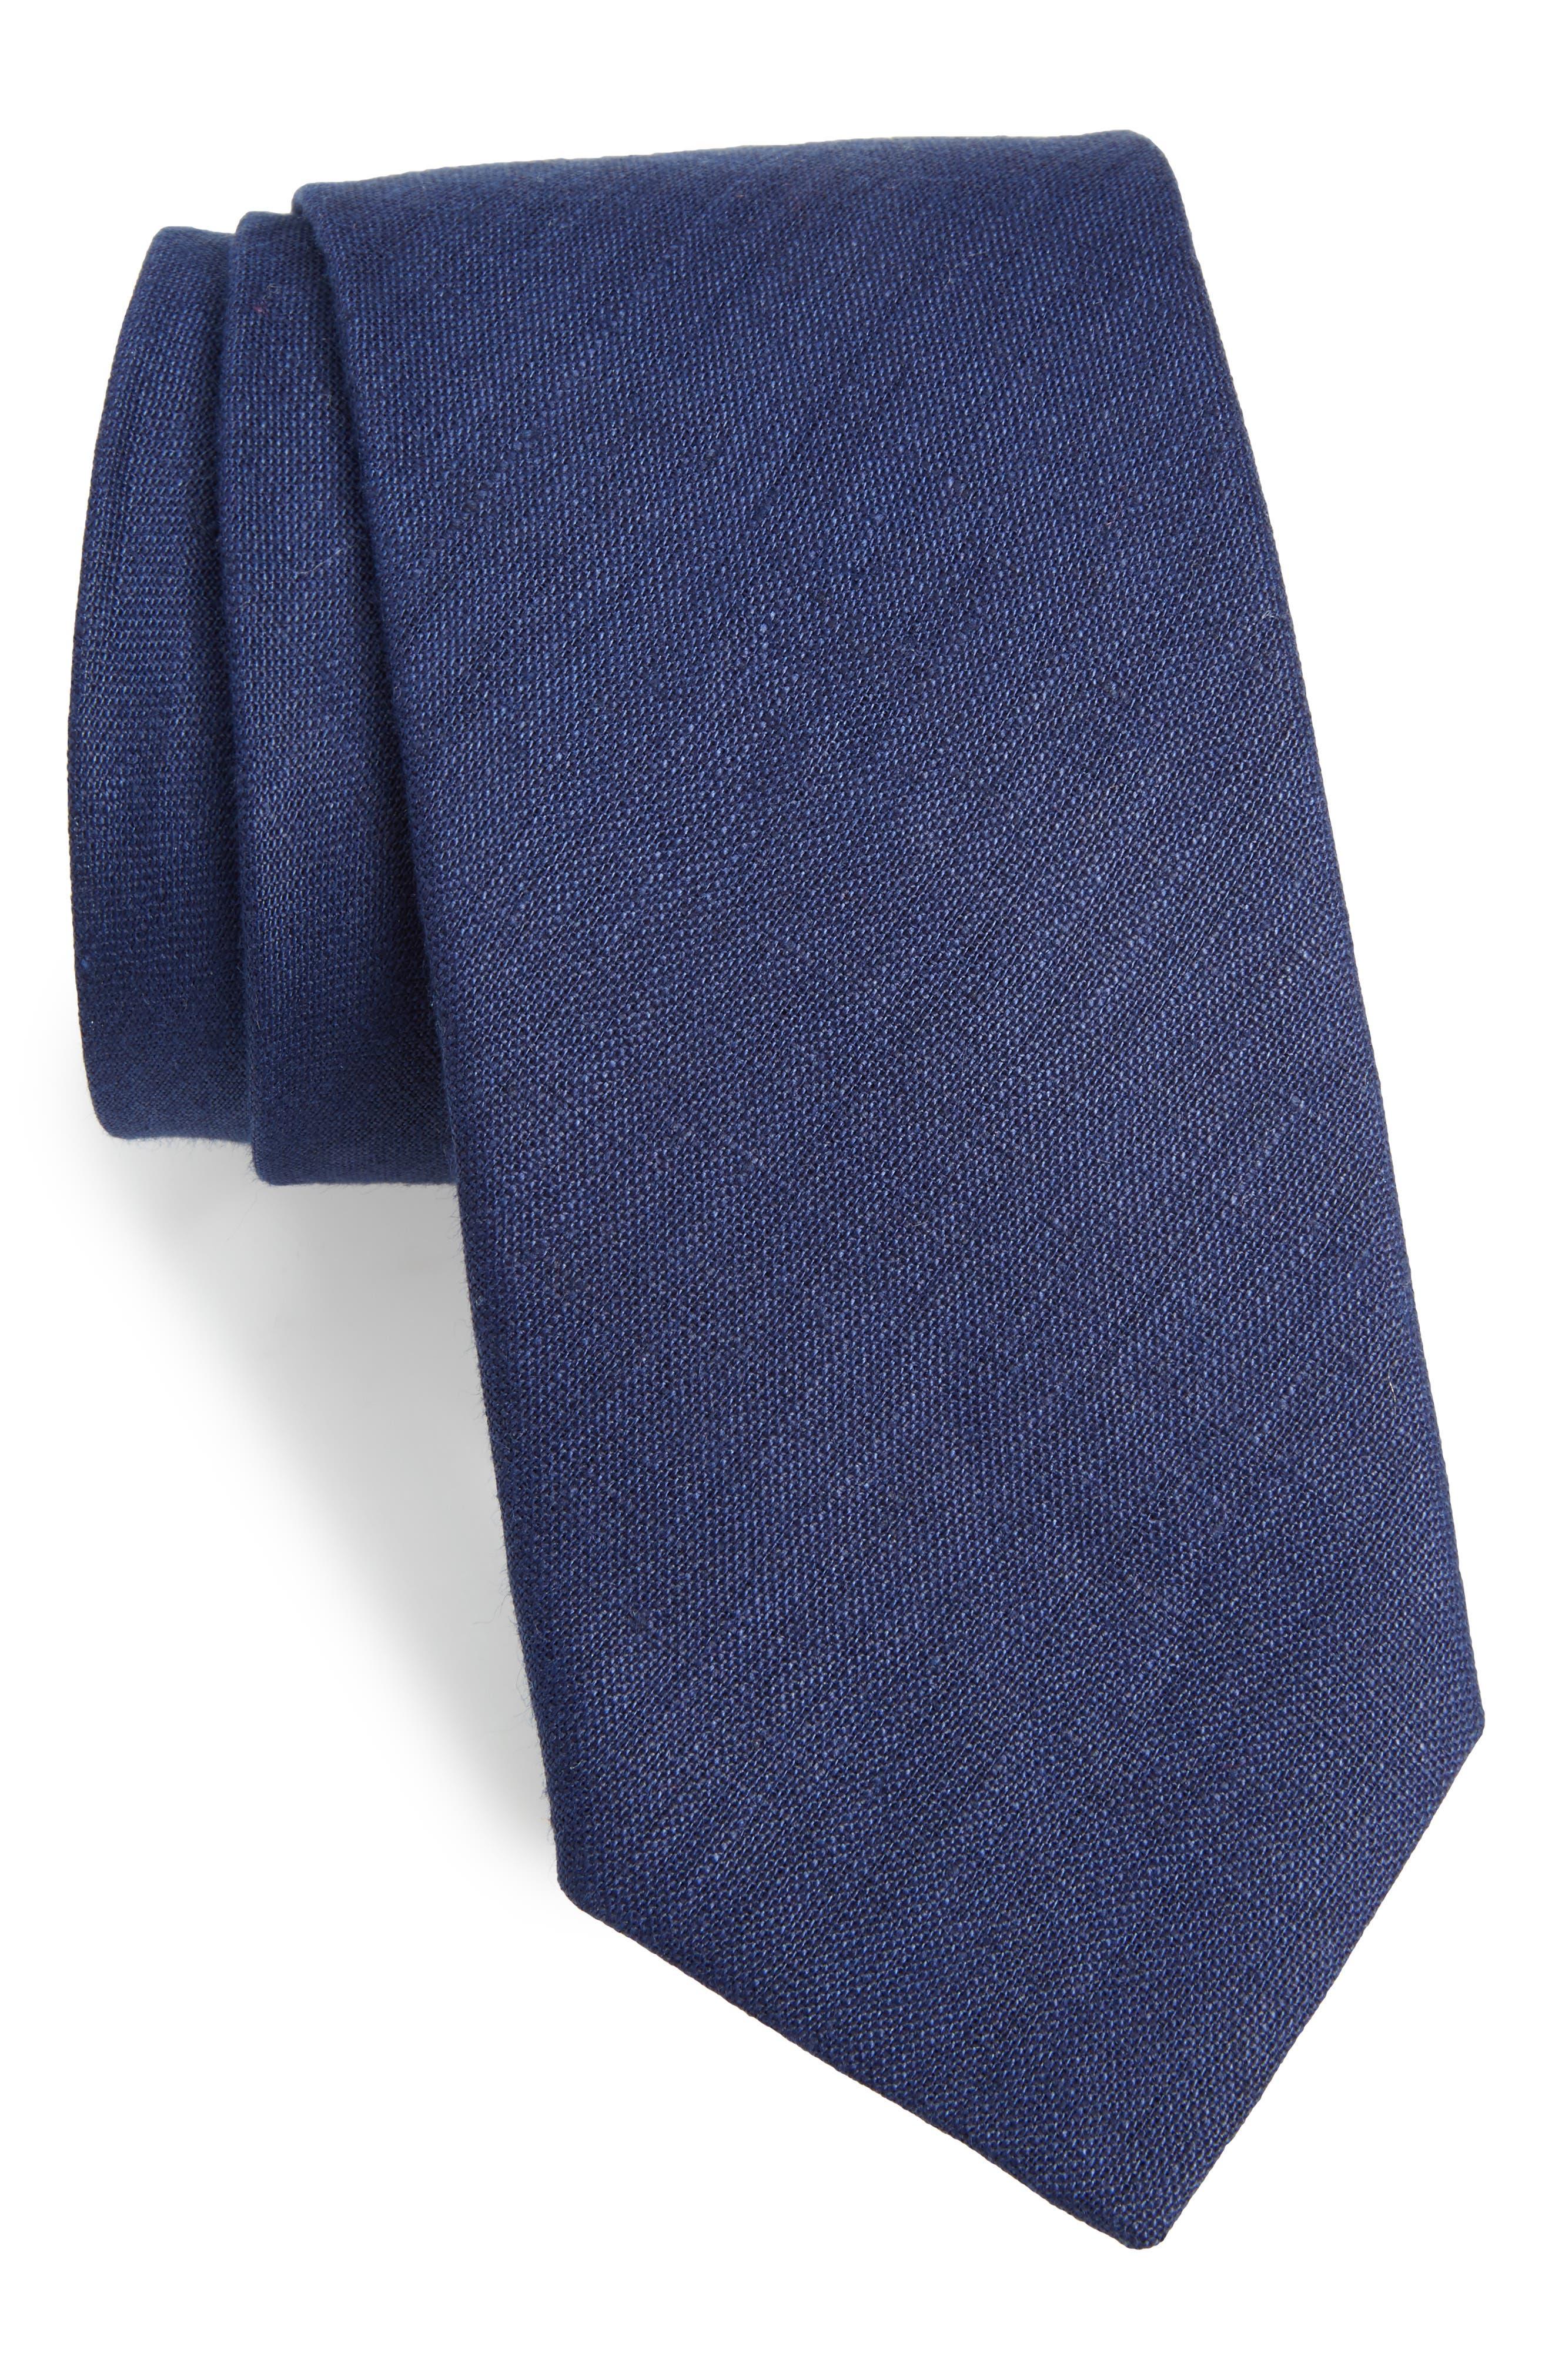 Solid Linen Tie,                             Main thumbnail 1, color,                             Solid Linen